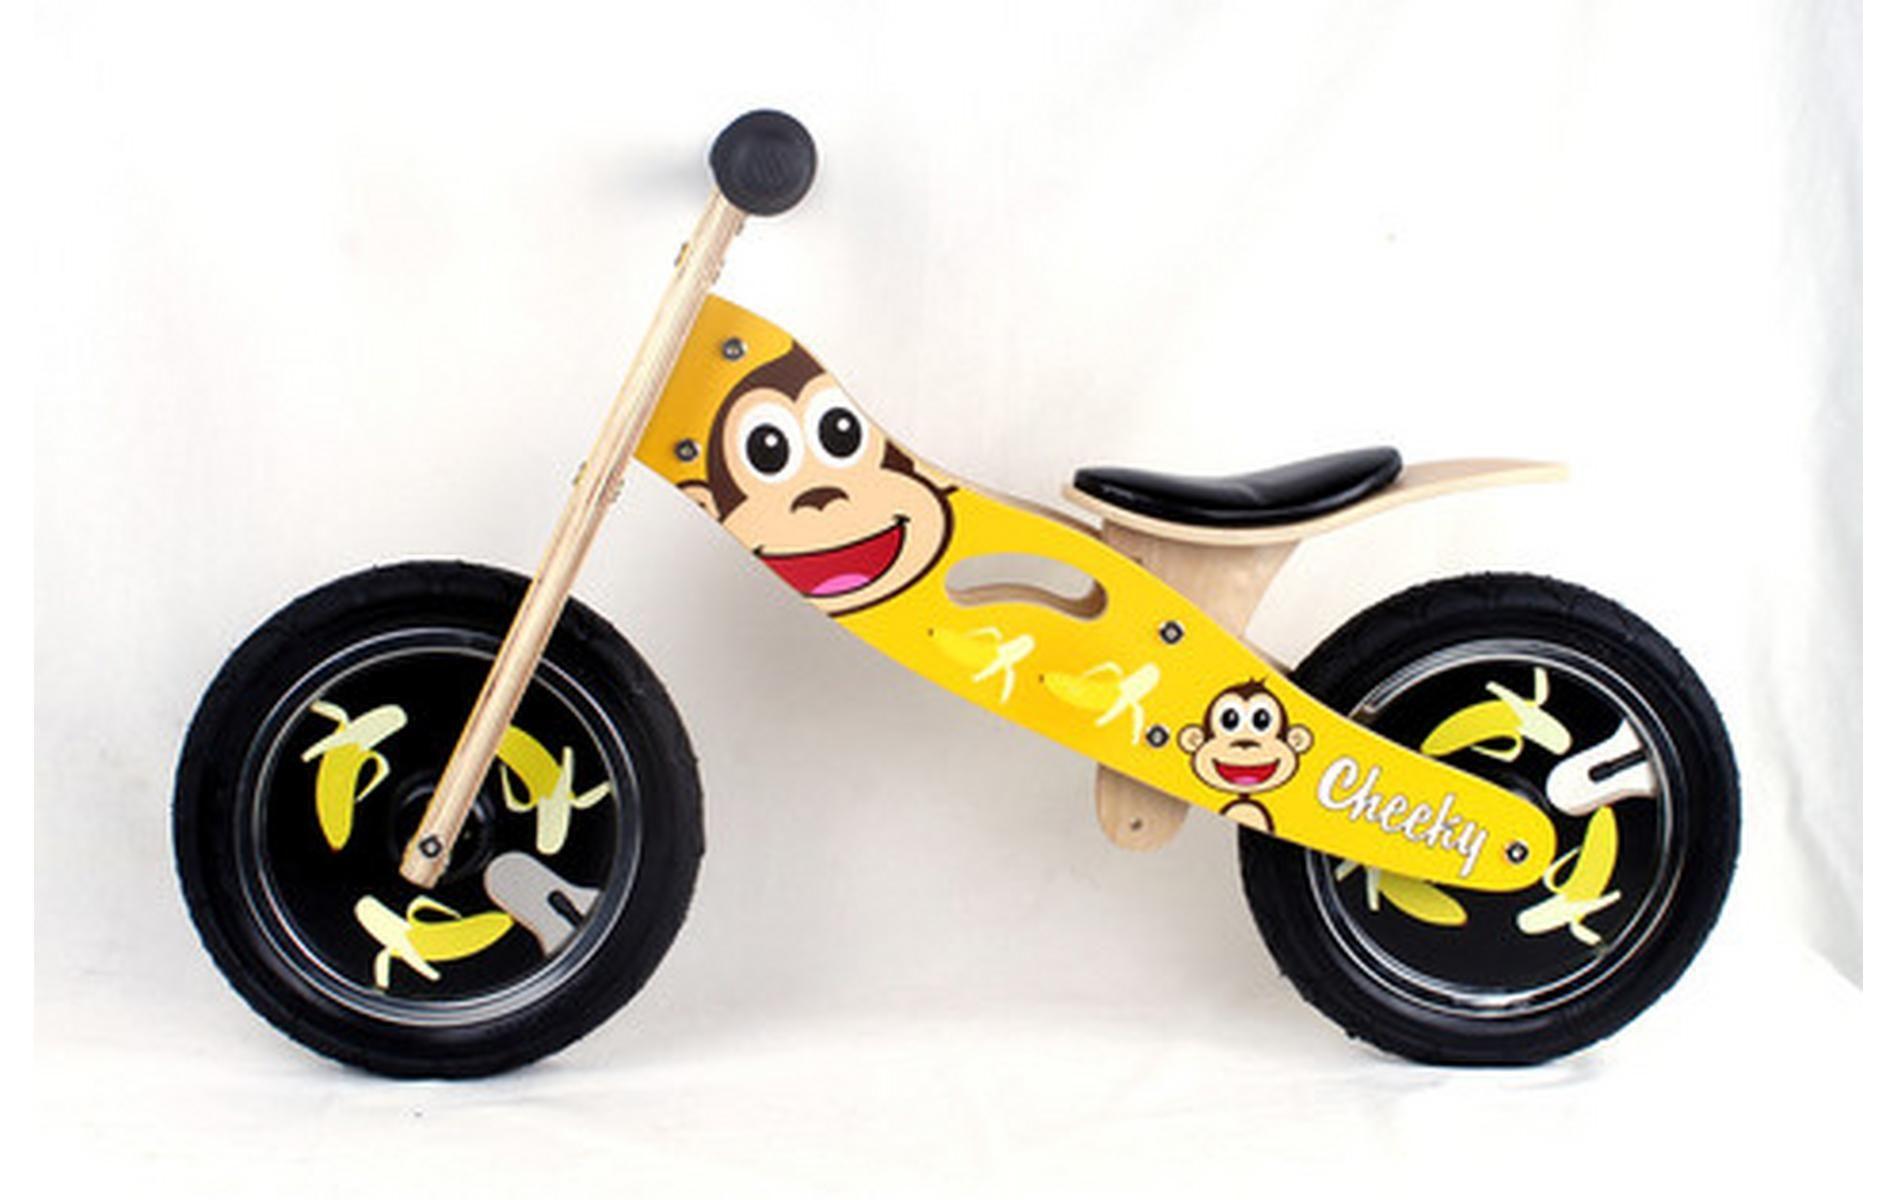 Kidzmotion Cheeky Wooden Balance Bike First Bike Running Bike